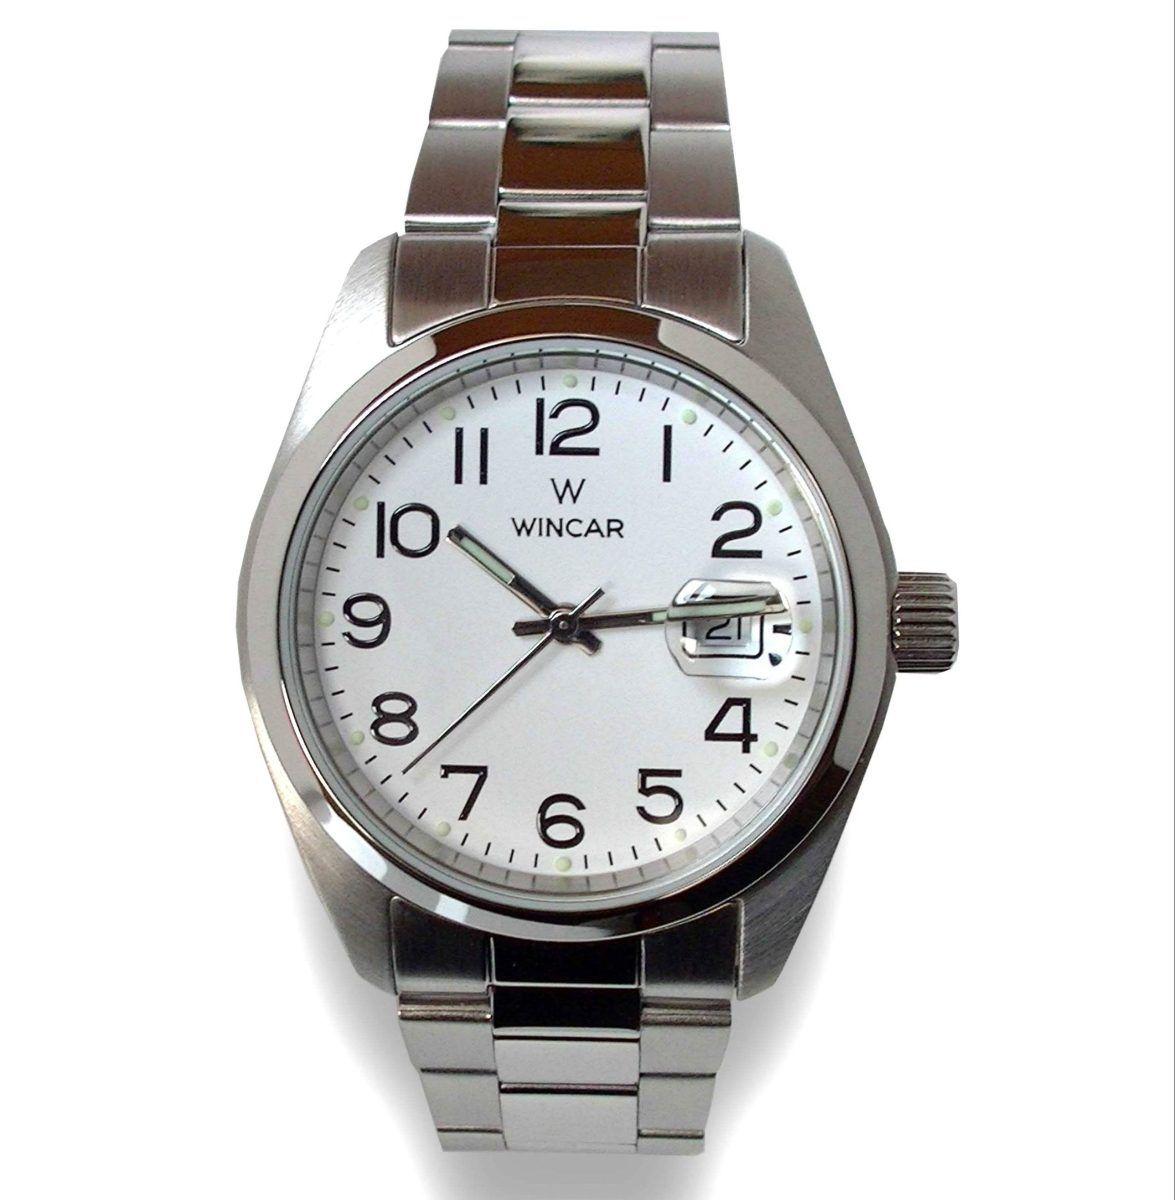 WINCAR Boris #wincar #orologi #uomo #watch #watches #orologio #lavoro #work #man #men